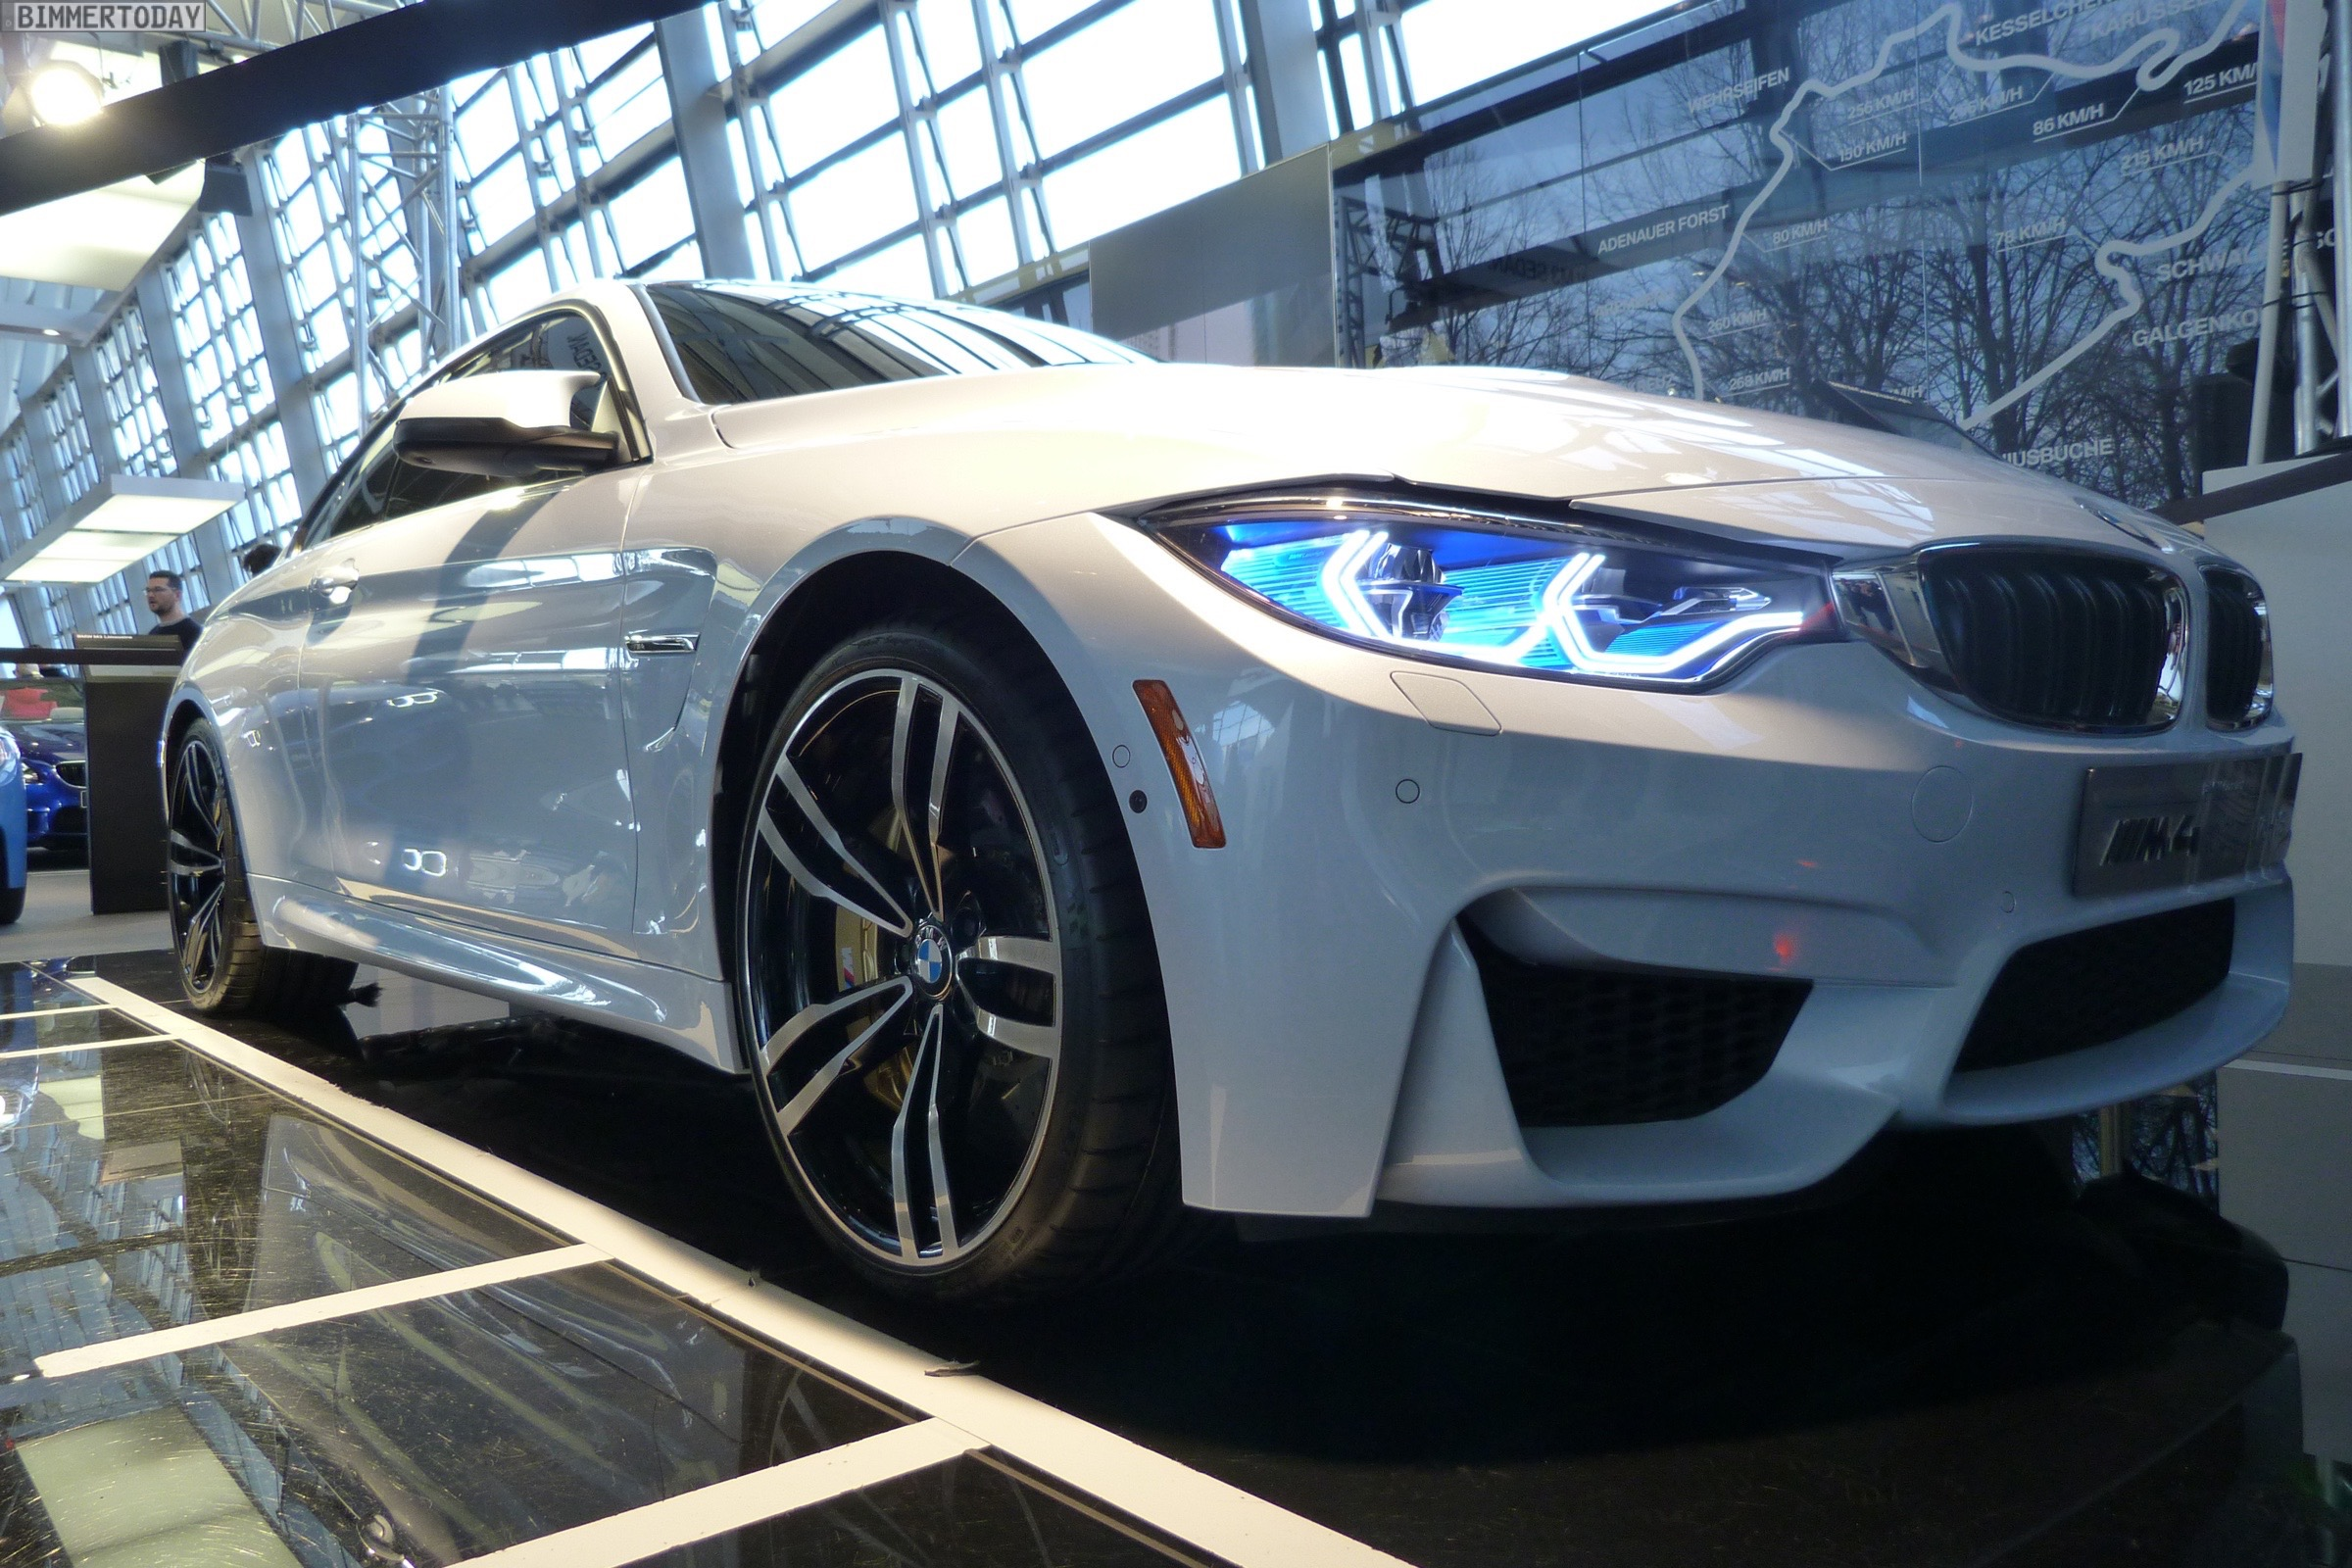 BMW M4 Iconic Lights Laser OLED Coupe F82 Welt 2015 09